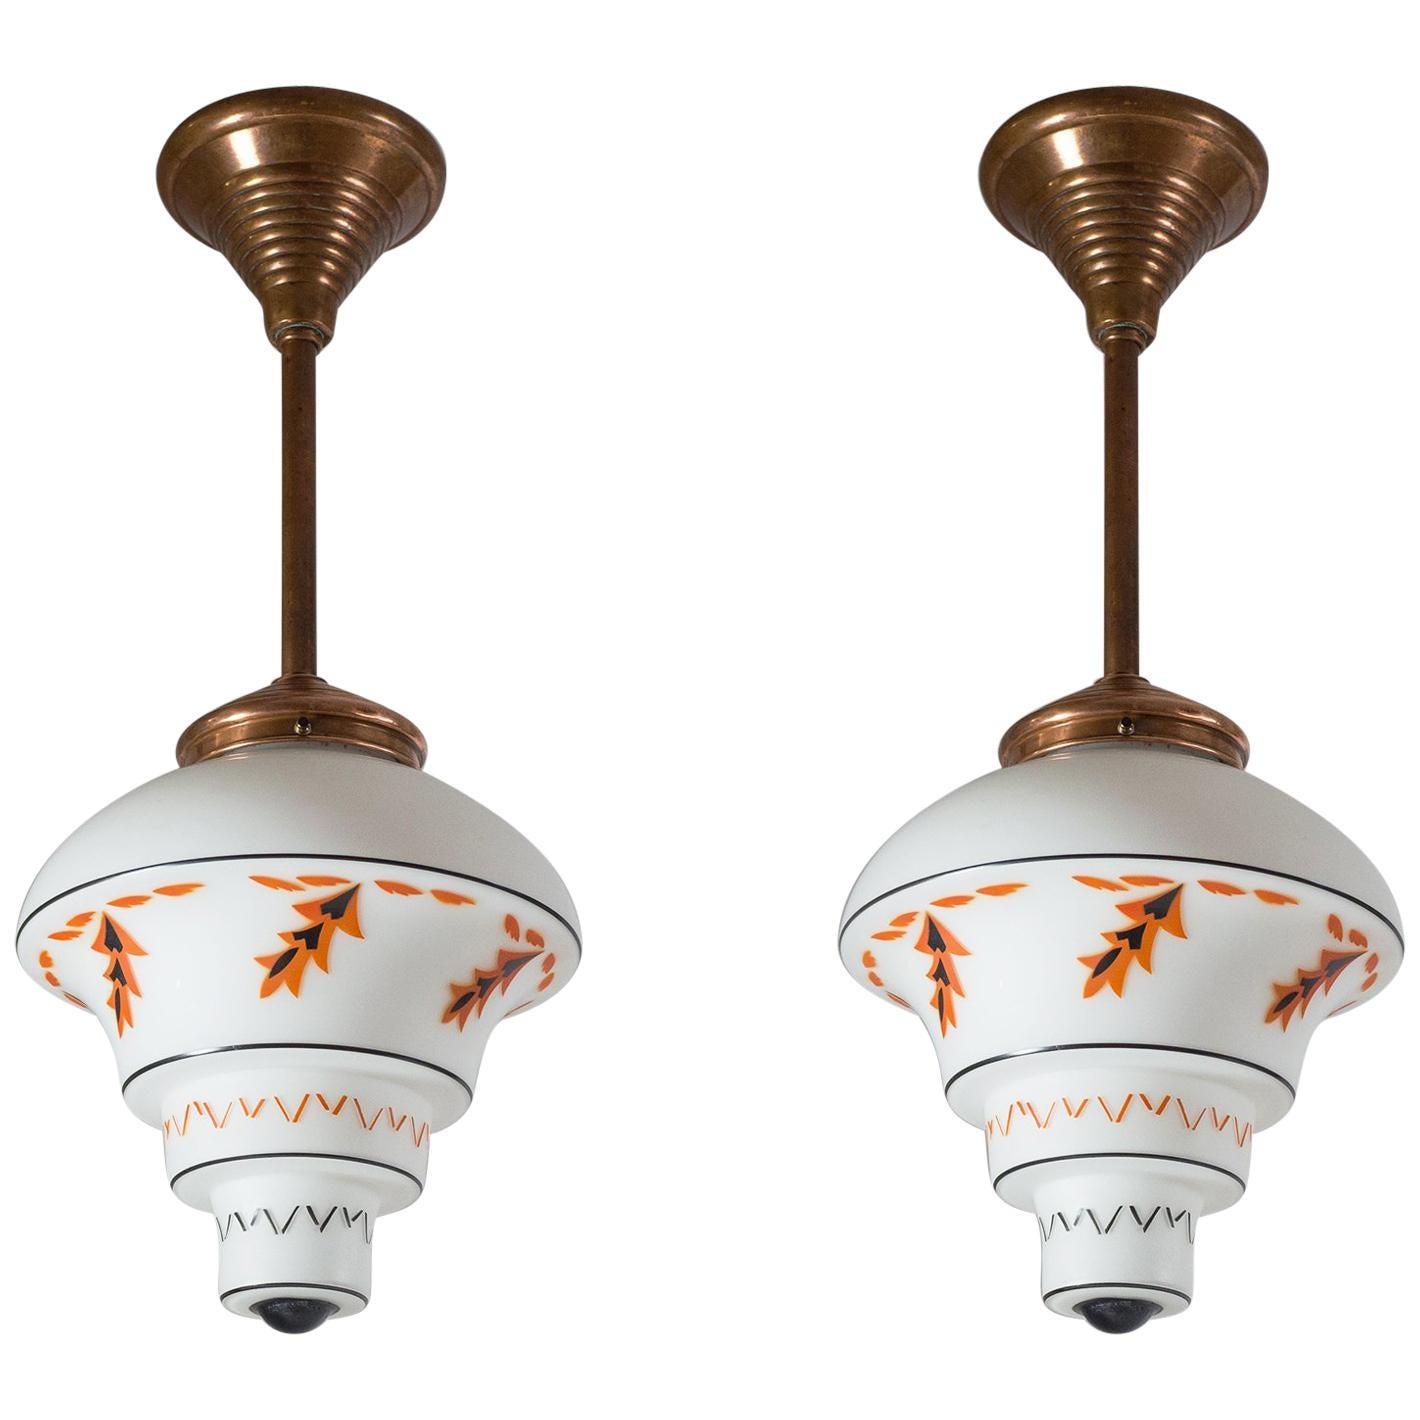 1920s Art Deco Pendants, Enameled Glass and Copper